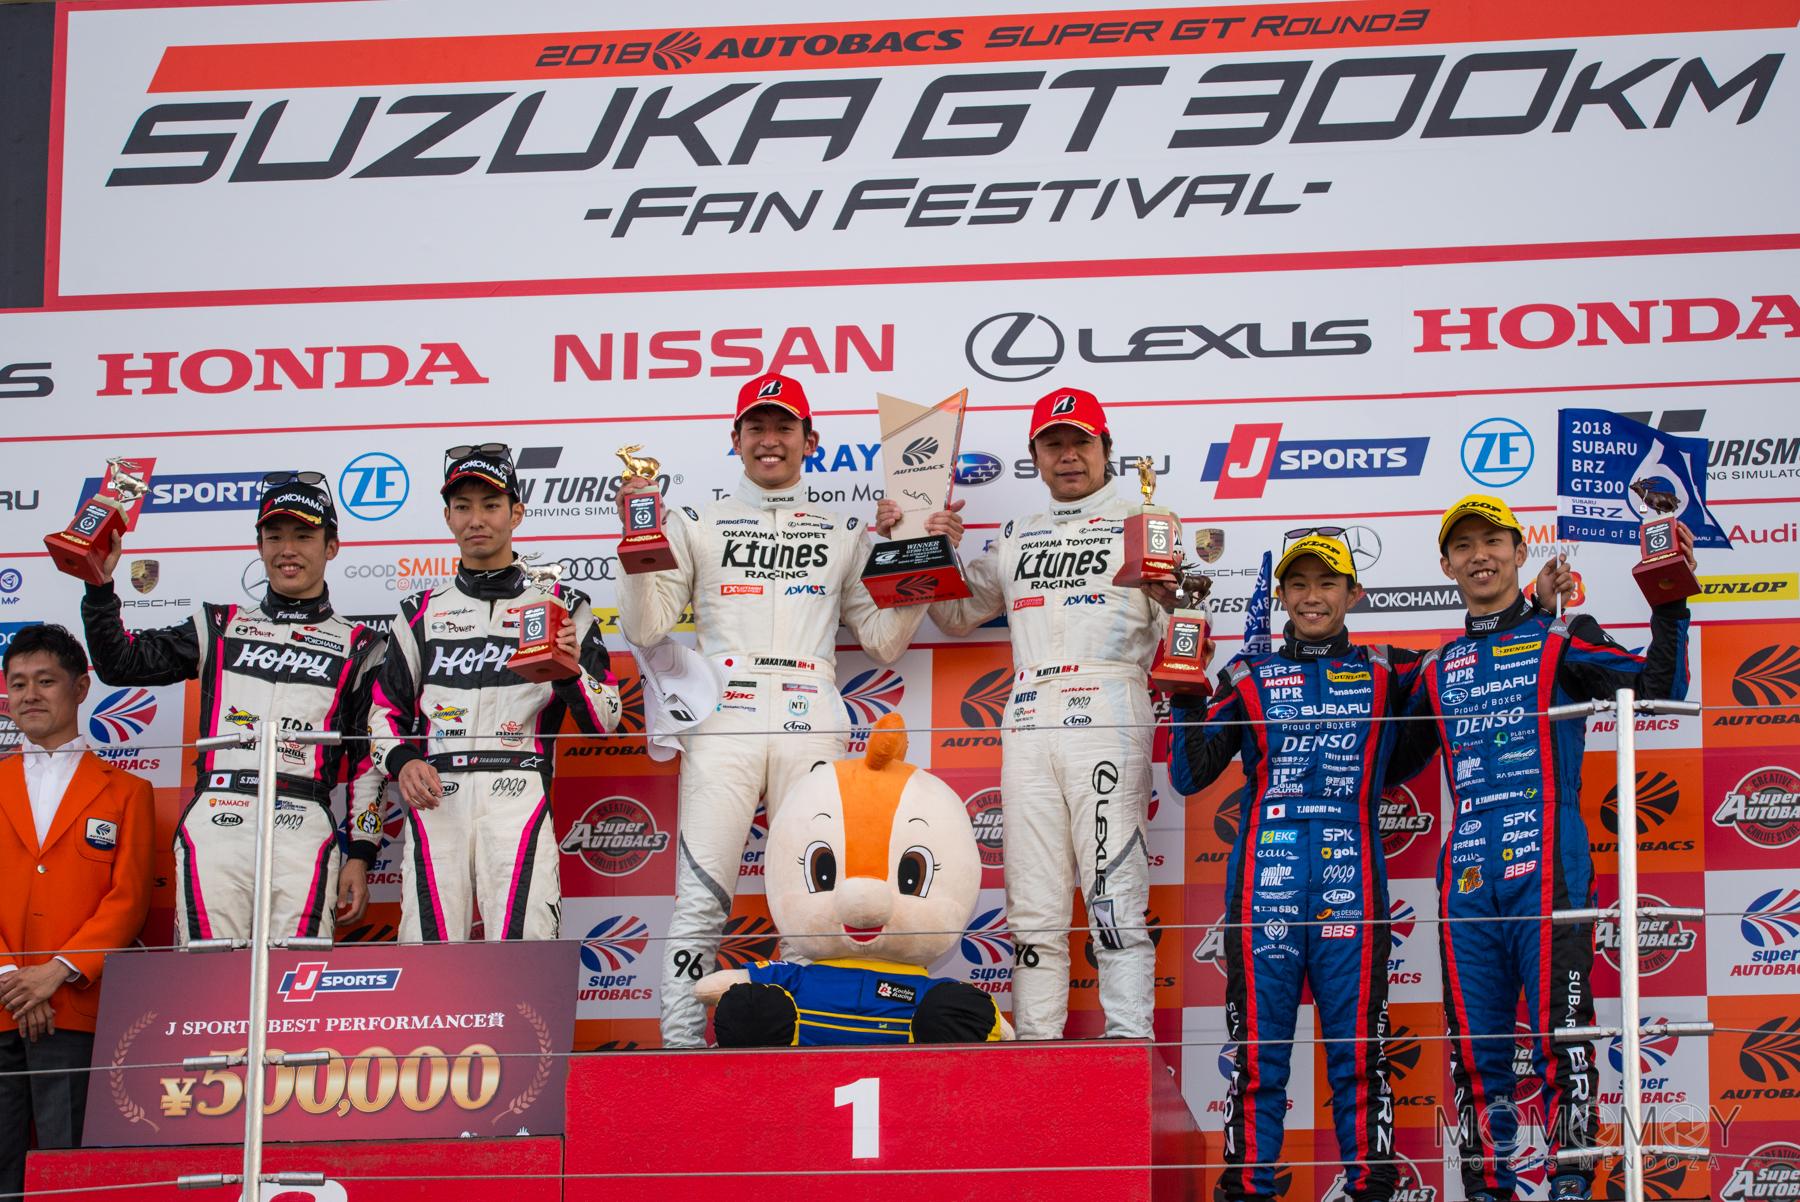 Suzuka GT 300 Km - Super GT. podium